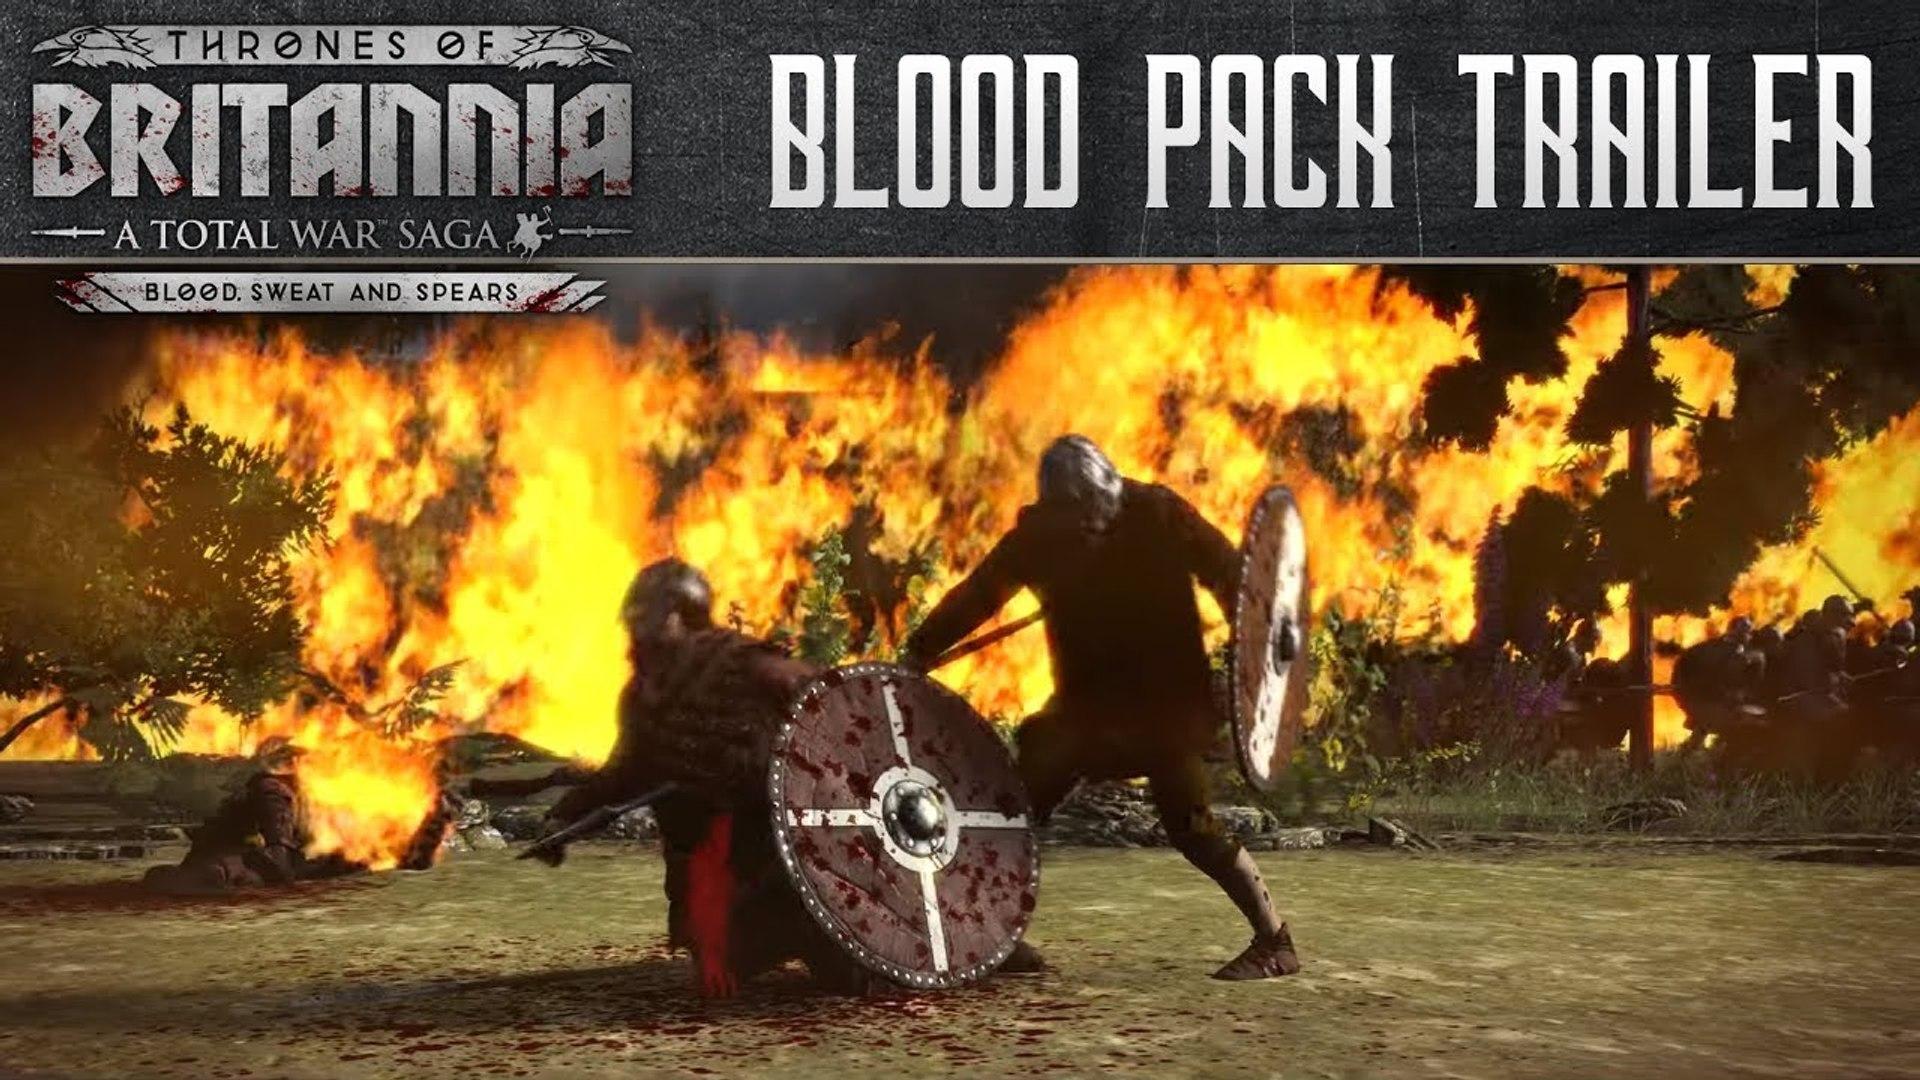 A Total War Saga : Thrones of Britannia - Blood, Sweat and Spears Trailer